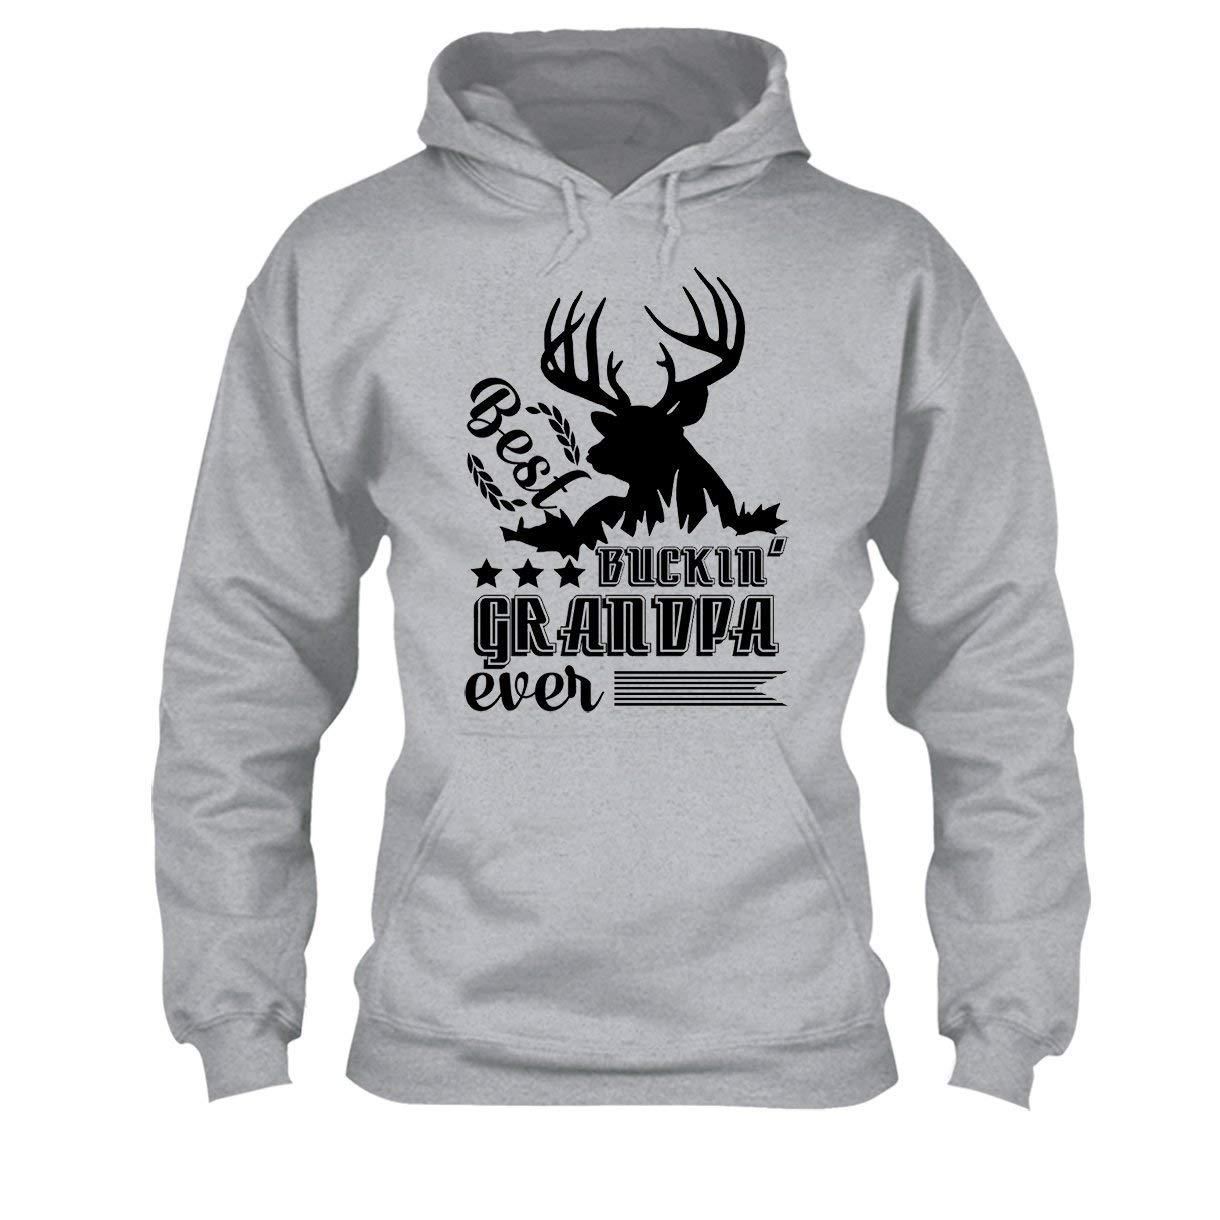 Hunting Best Buckin Grandpa Ever Tee Shirt Cool Long Sleeve Shirt